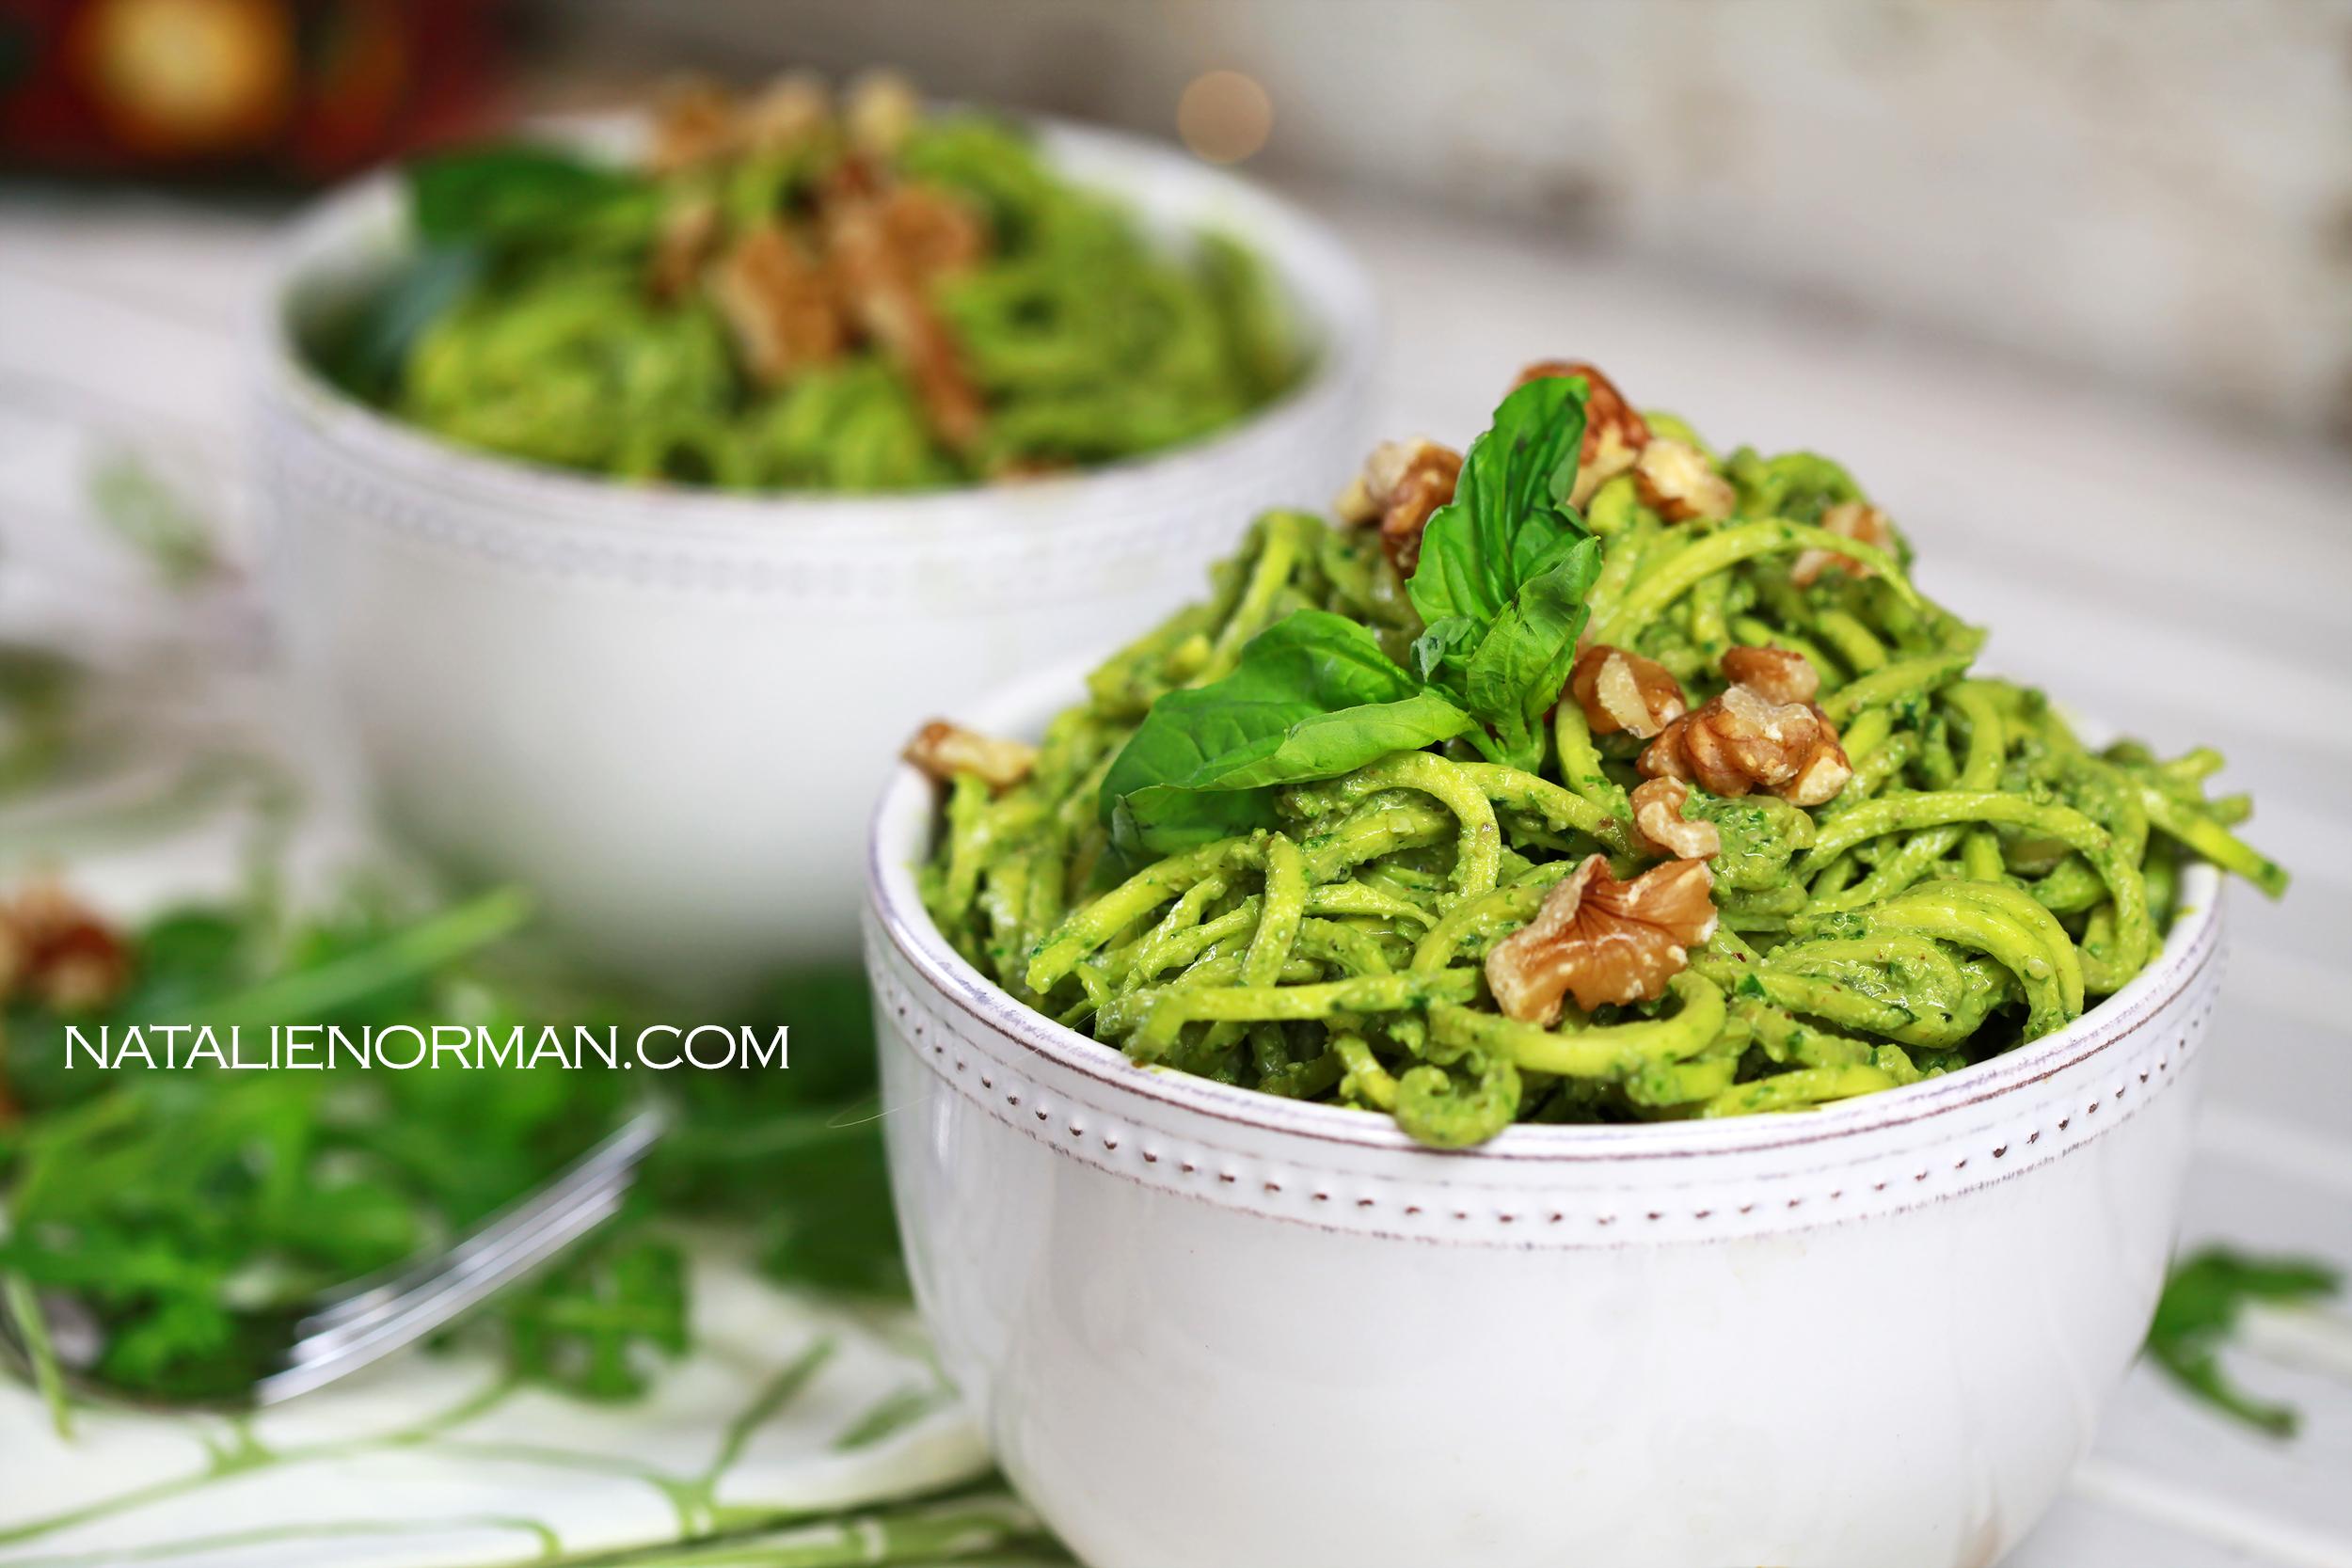 Fast and Easy Raw Vegan Meals: Walnut, Arugula and Basil Pesto